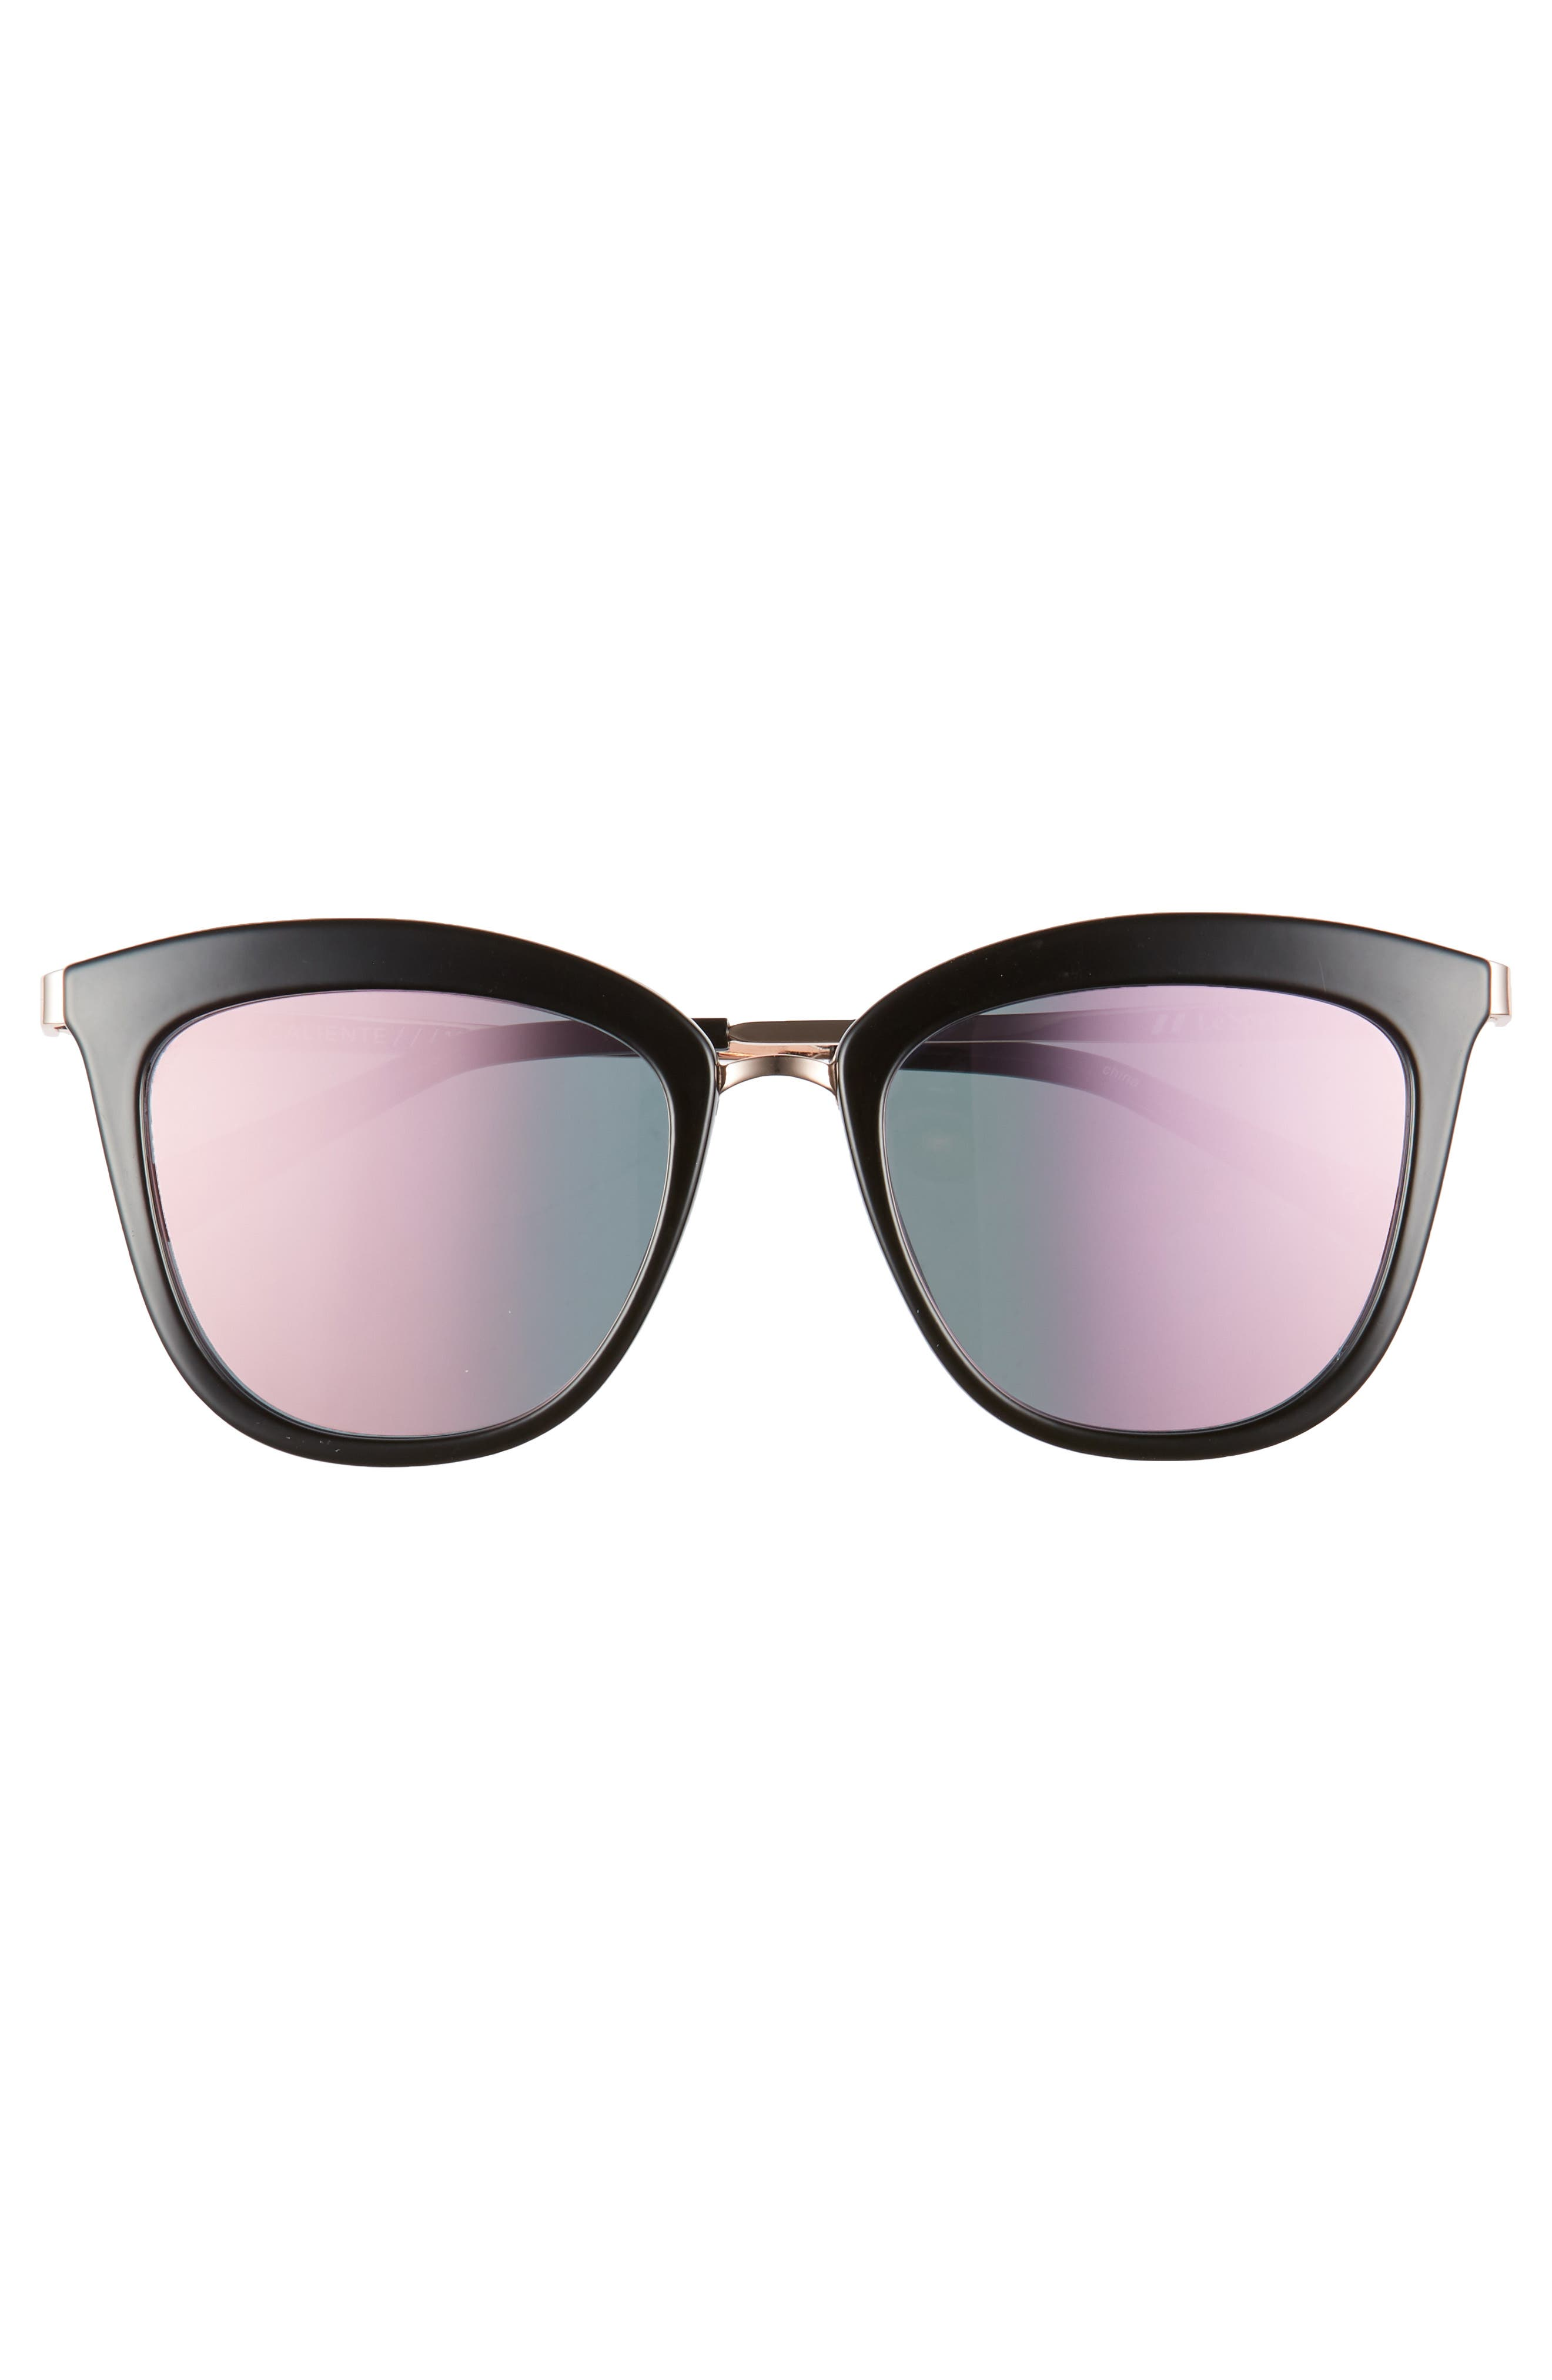 Caliente 53mm Cat Eye Sunglasses,                             Alternate thumbnail 3, color,                             Black/ Rose Gold